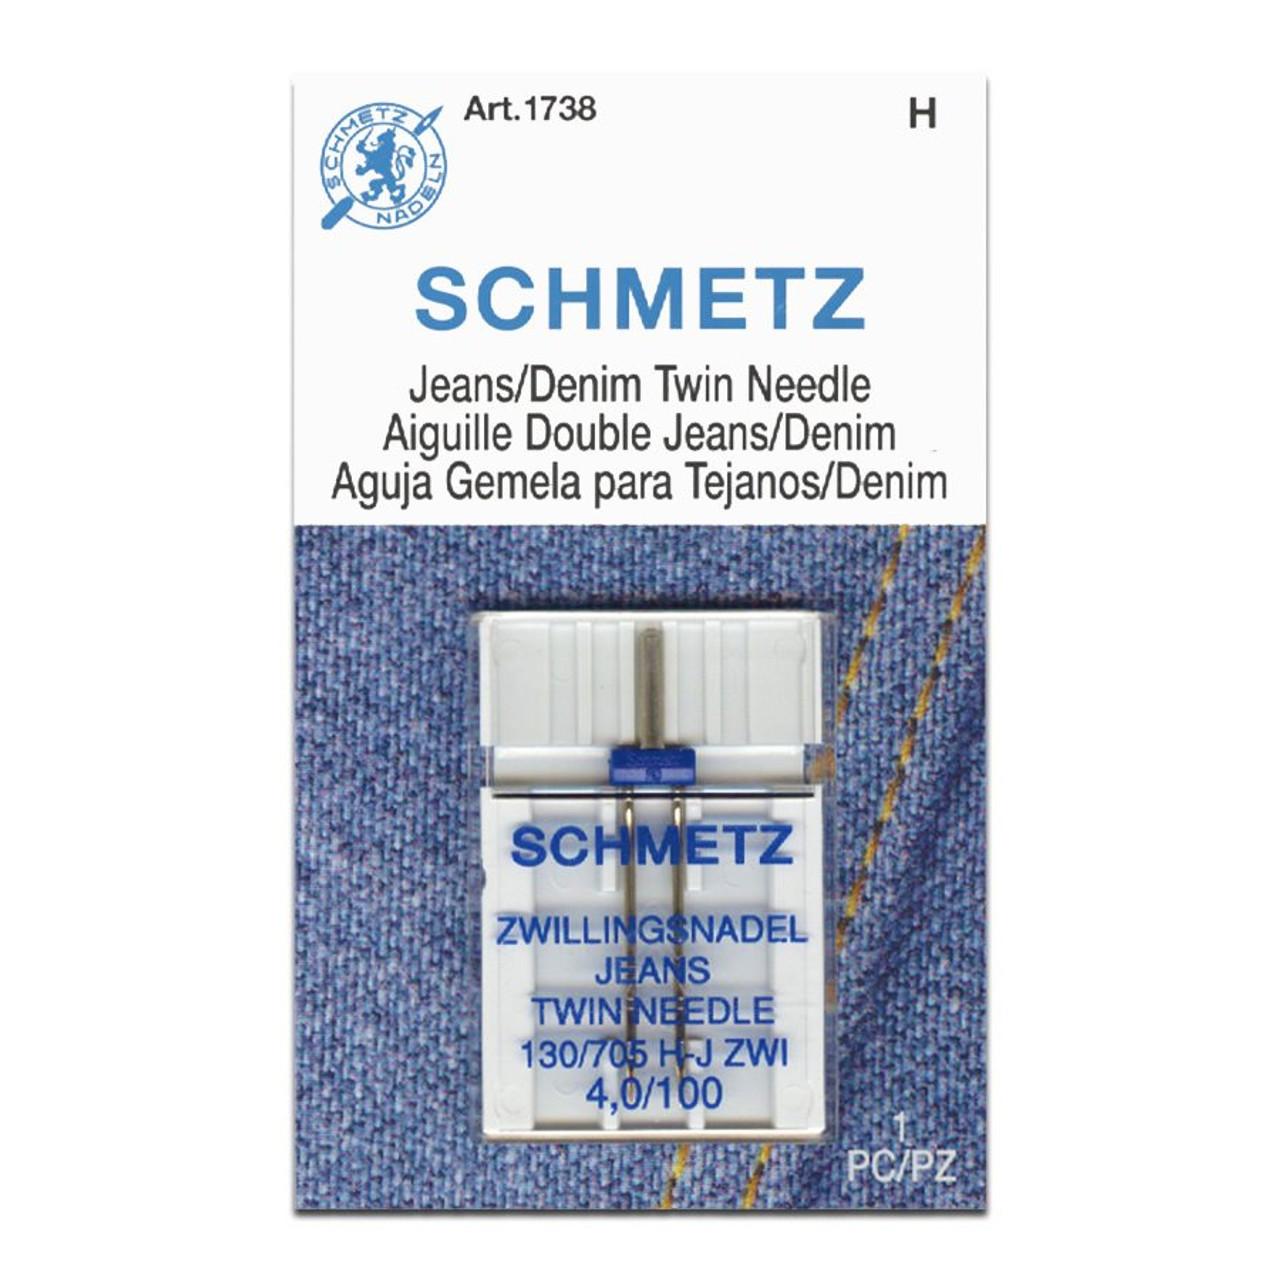 Schmetz Jeans/Denim Twin Needle, Size 4.0/100